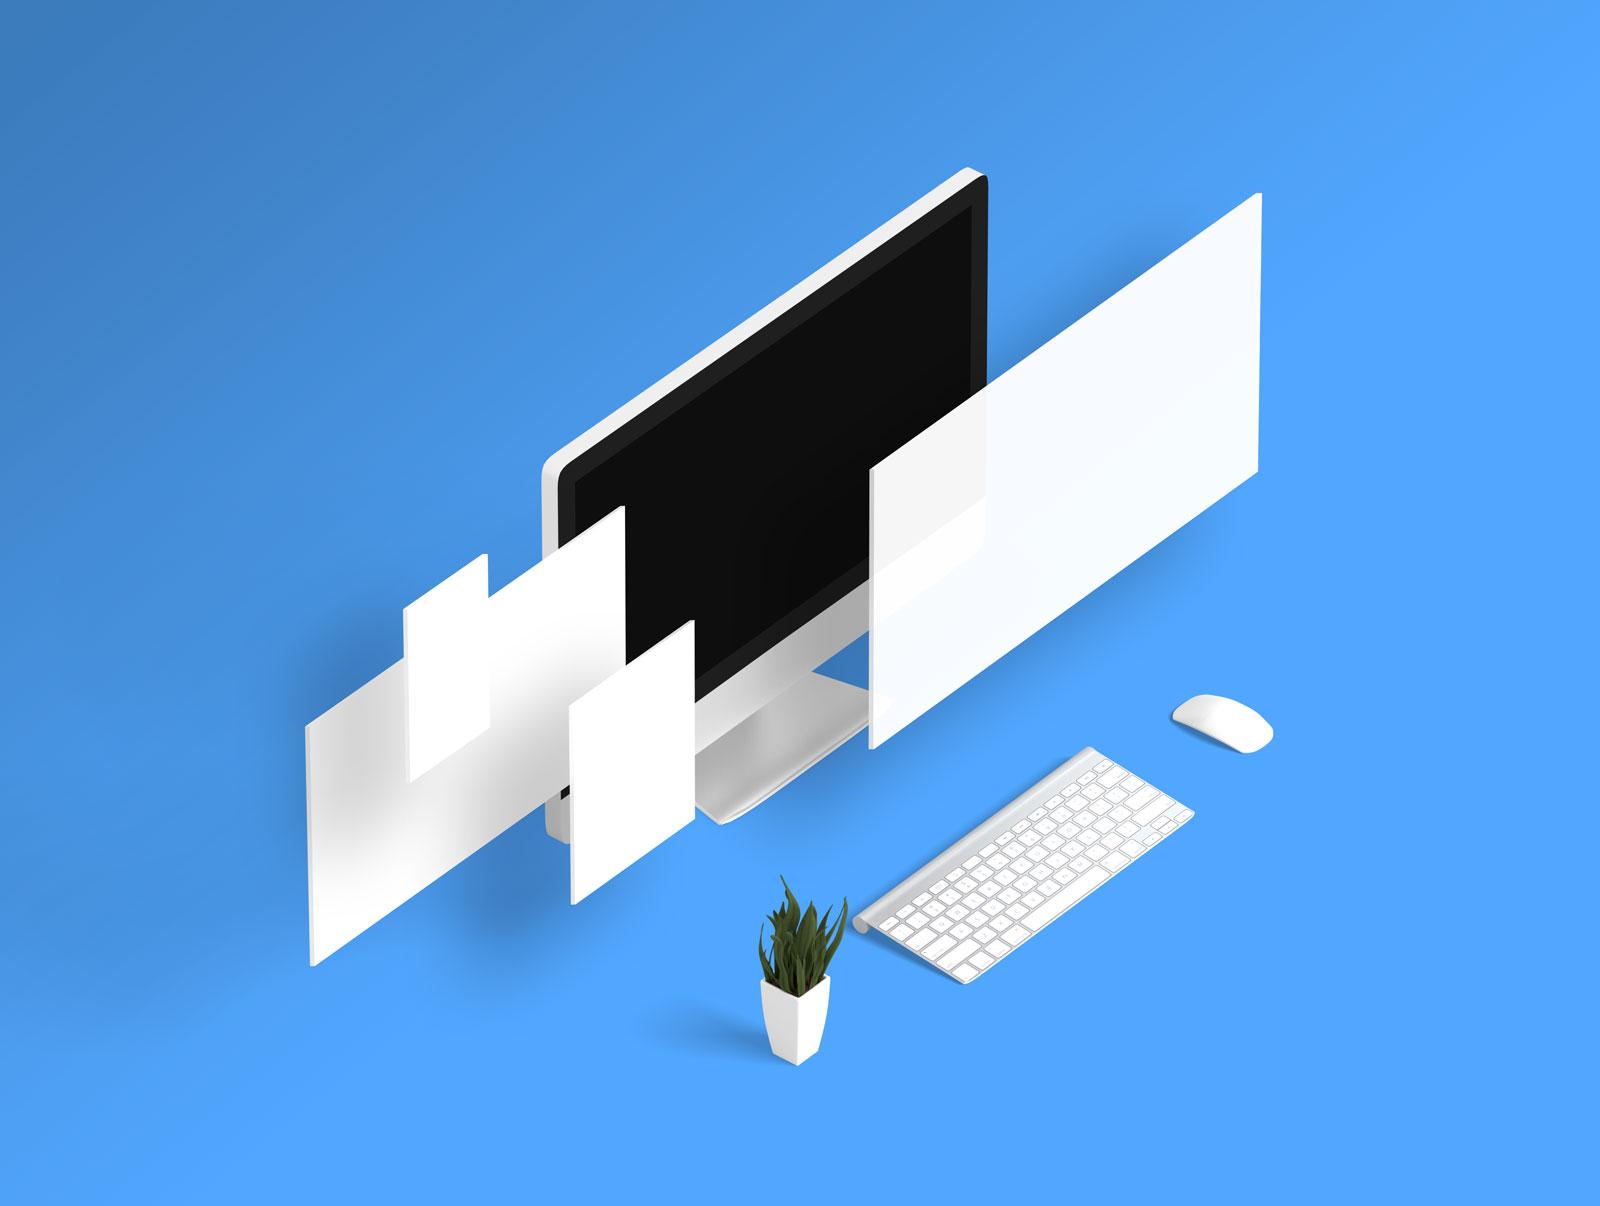 Free-Responsive-Web-Design-Showcasing-Mockup-PSD-2